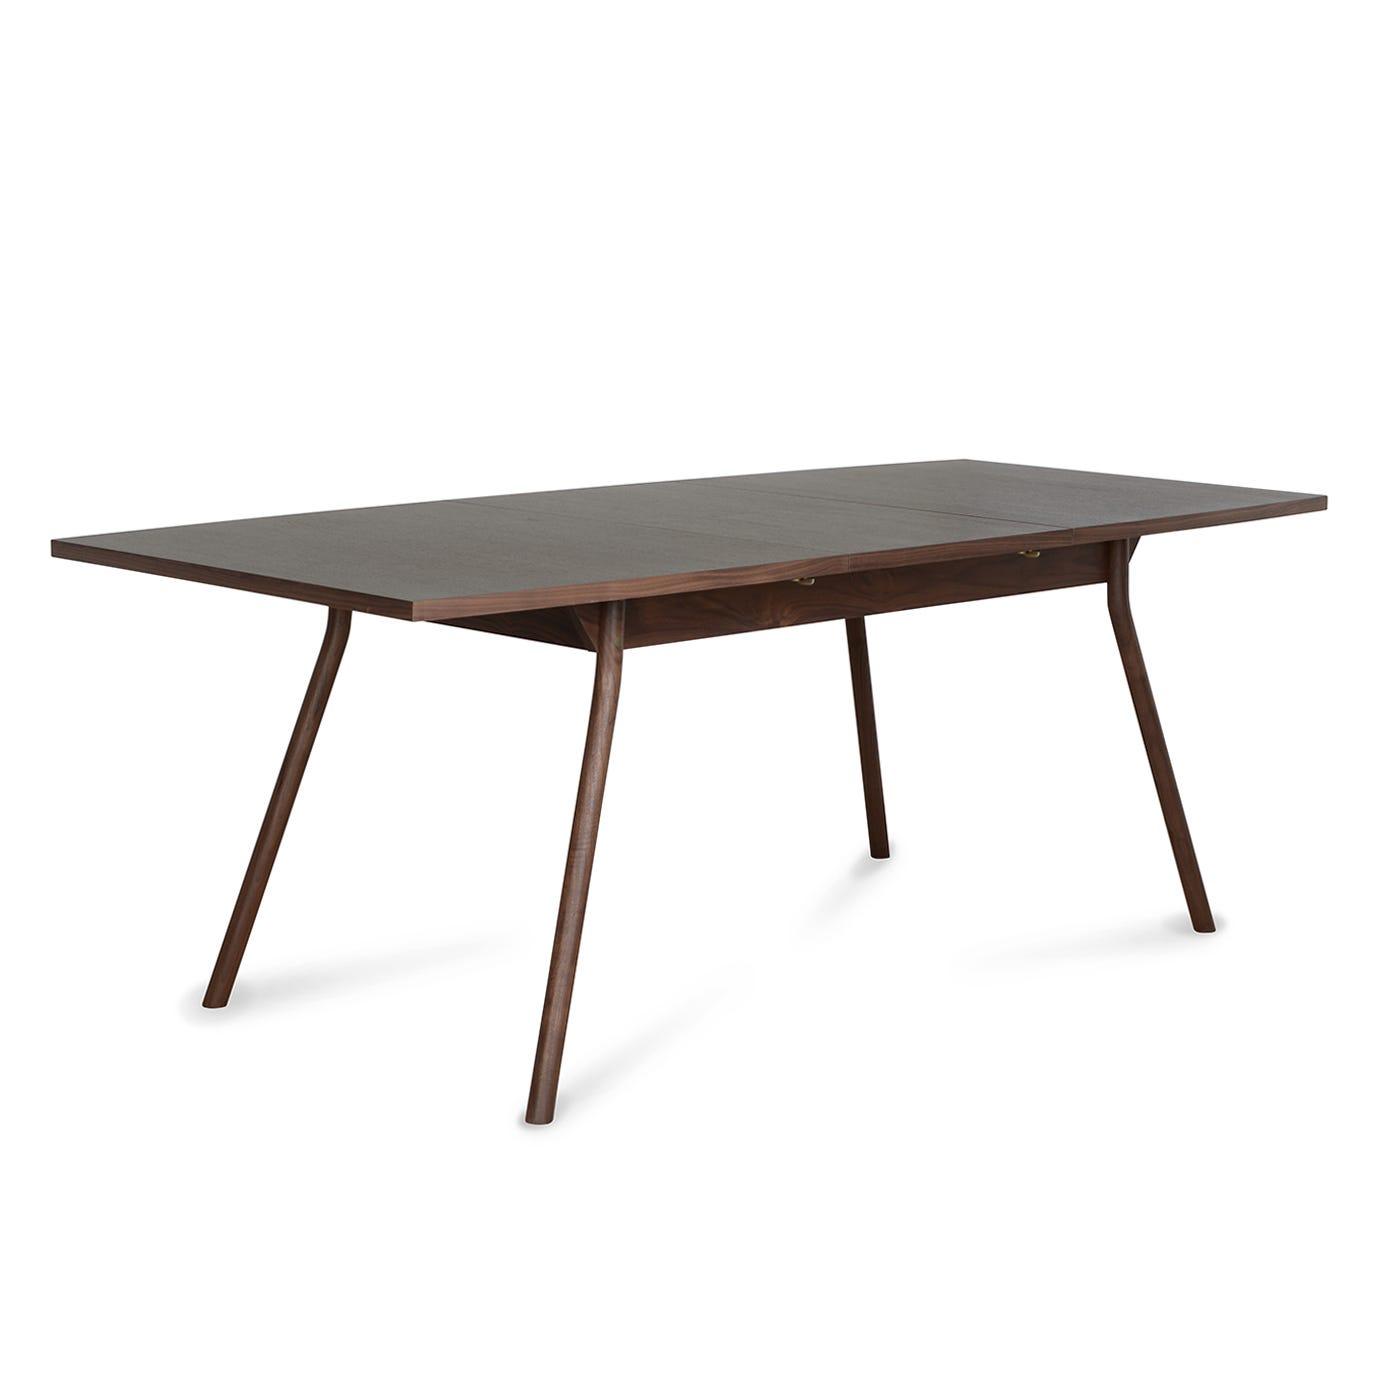 Novak 4-6 Seater Extending Dining Table